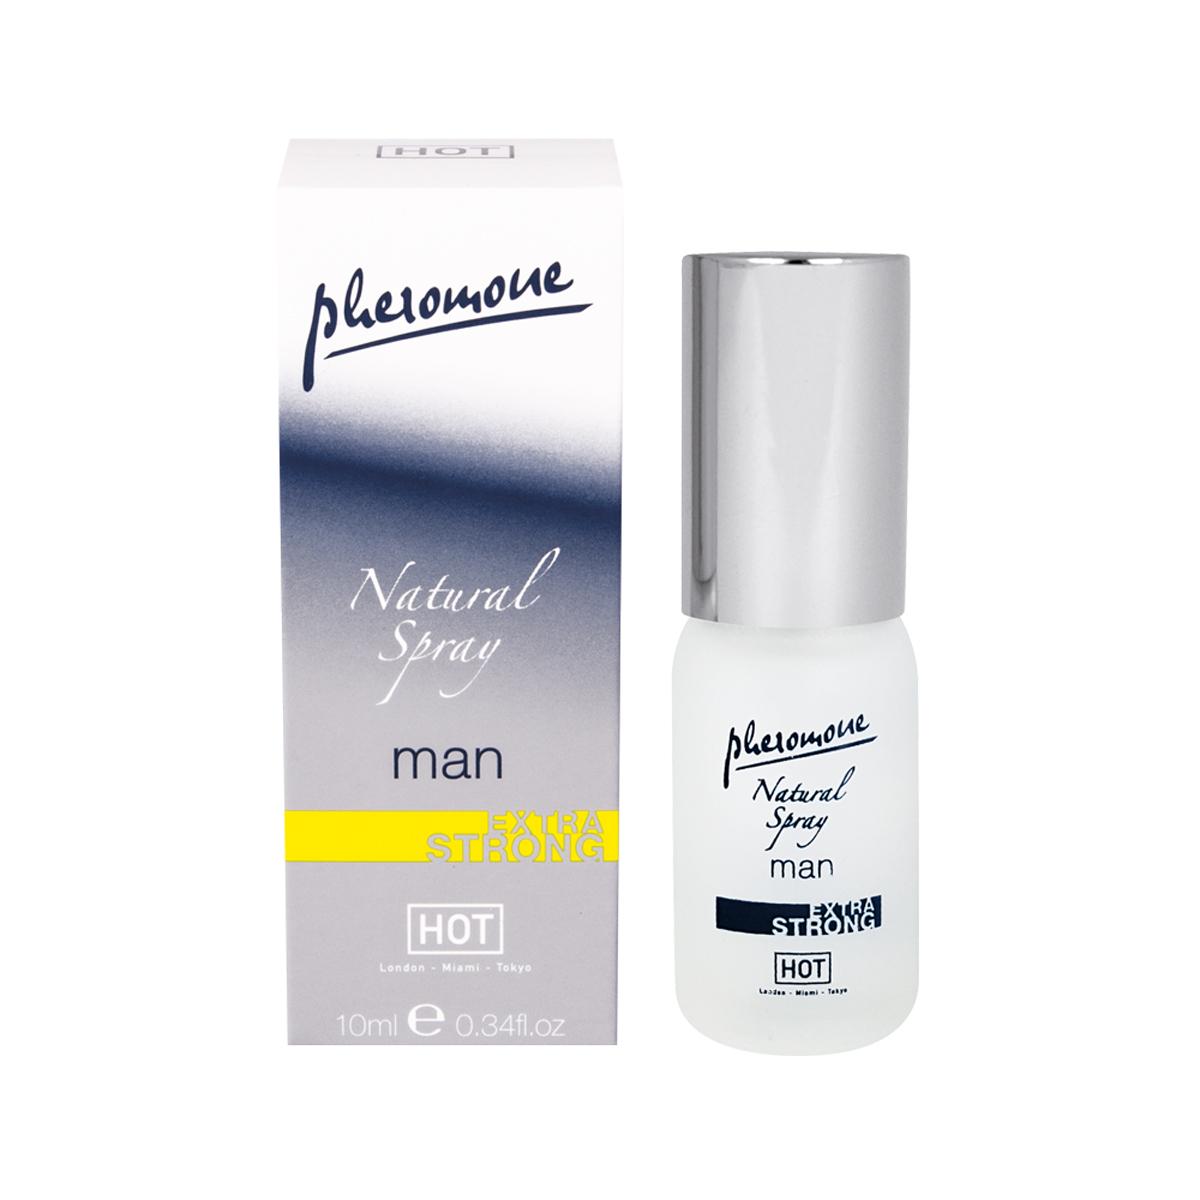 Hot Мужские духи с феромонами Natural Spray extra strong, 10 мл strong 210 купить